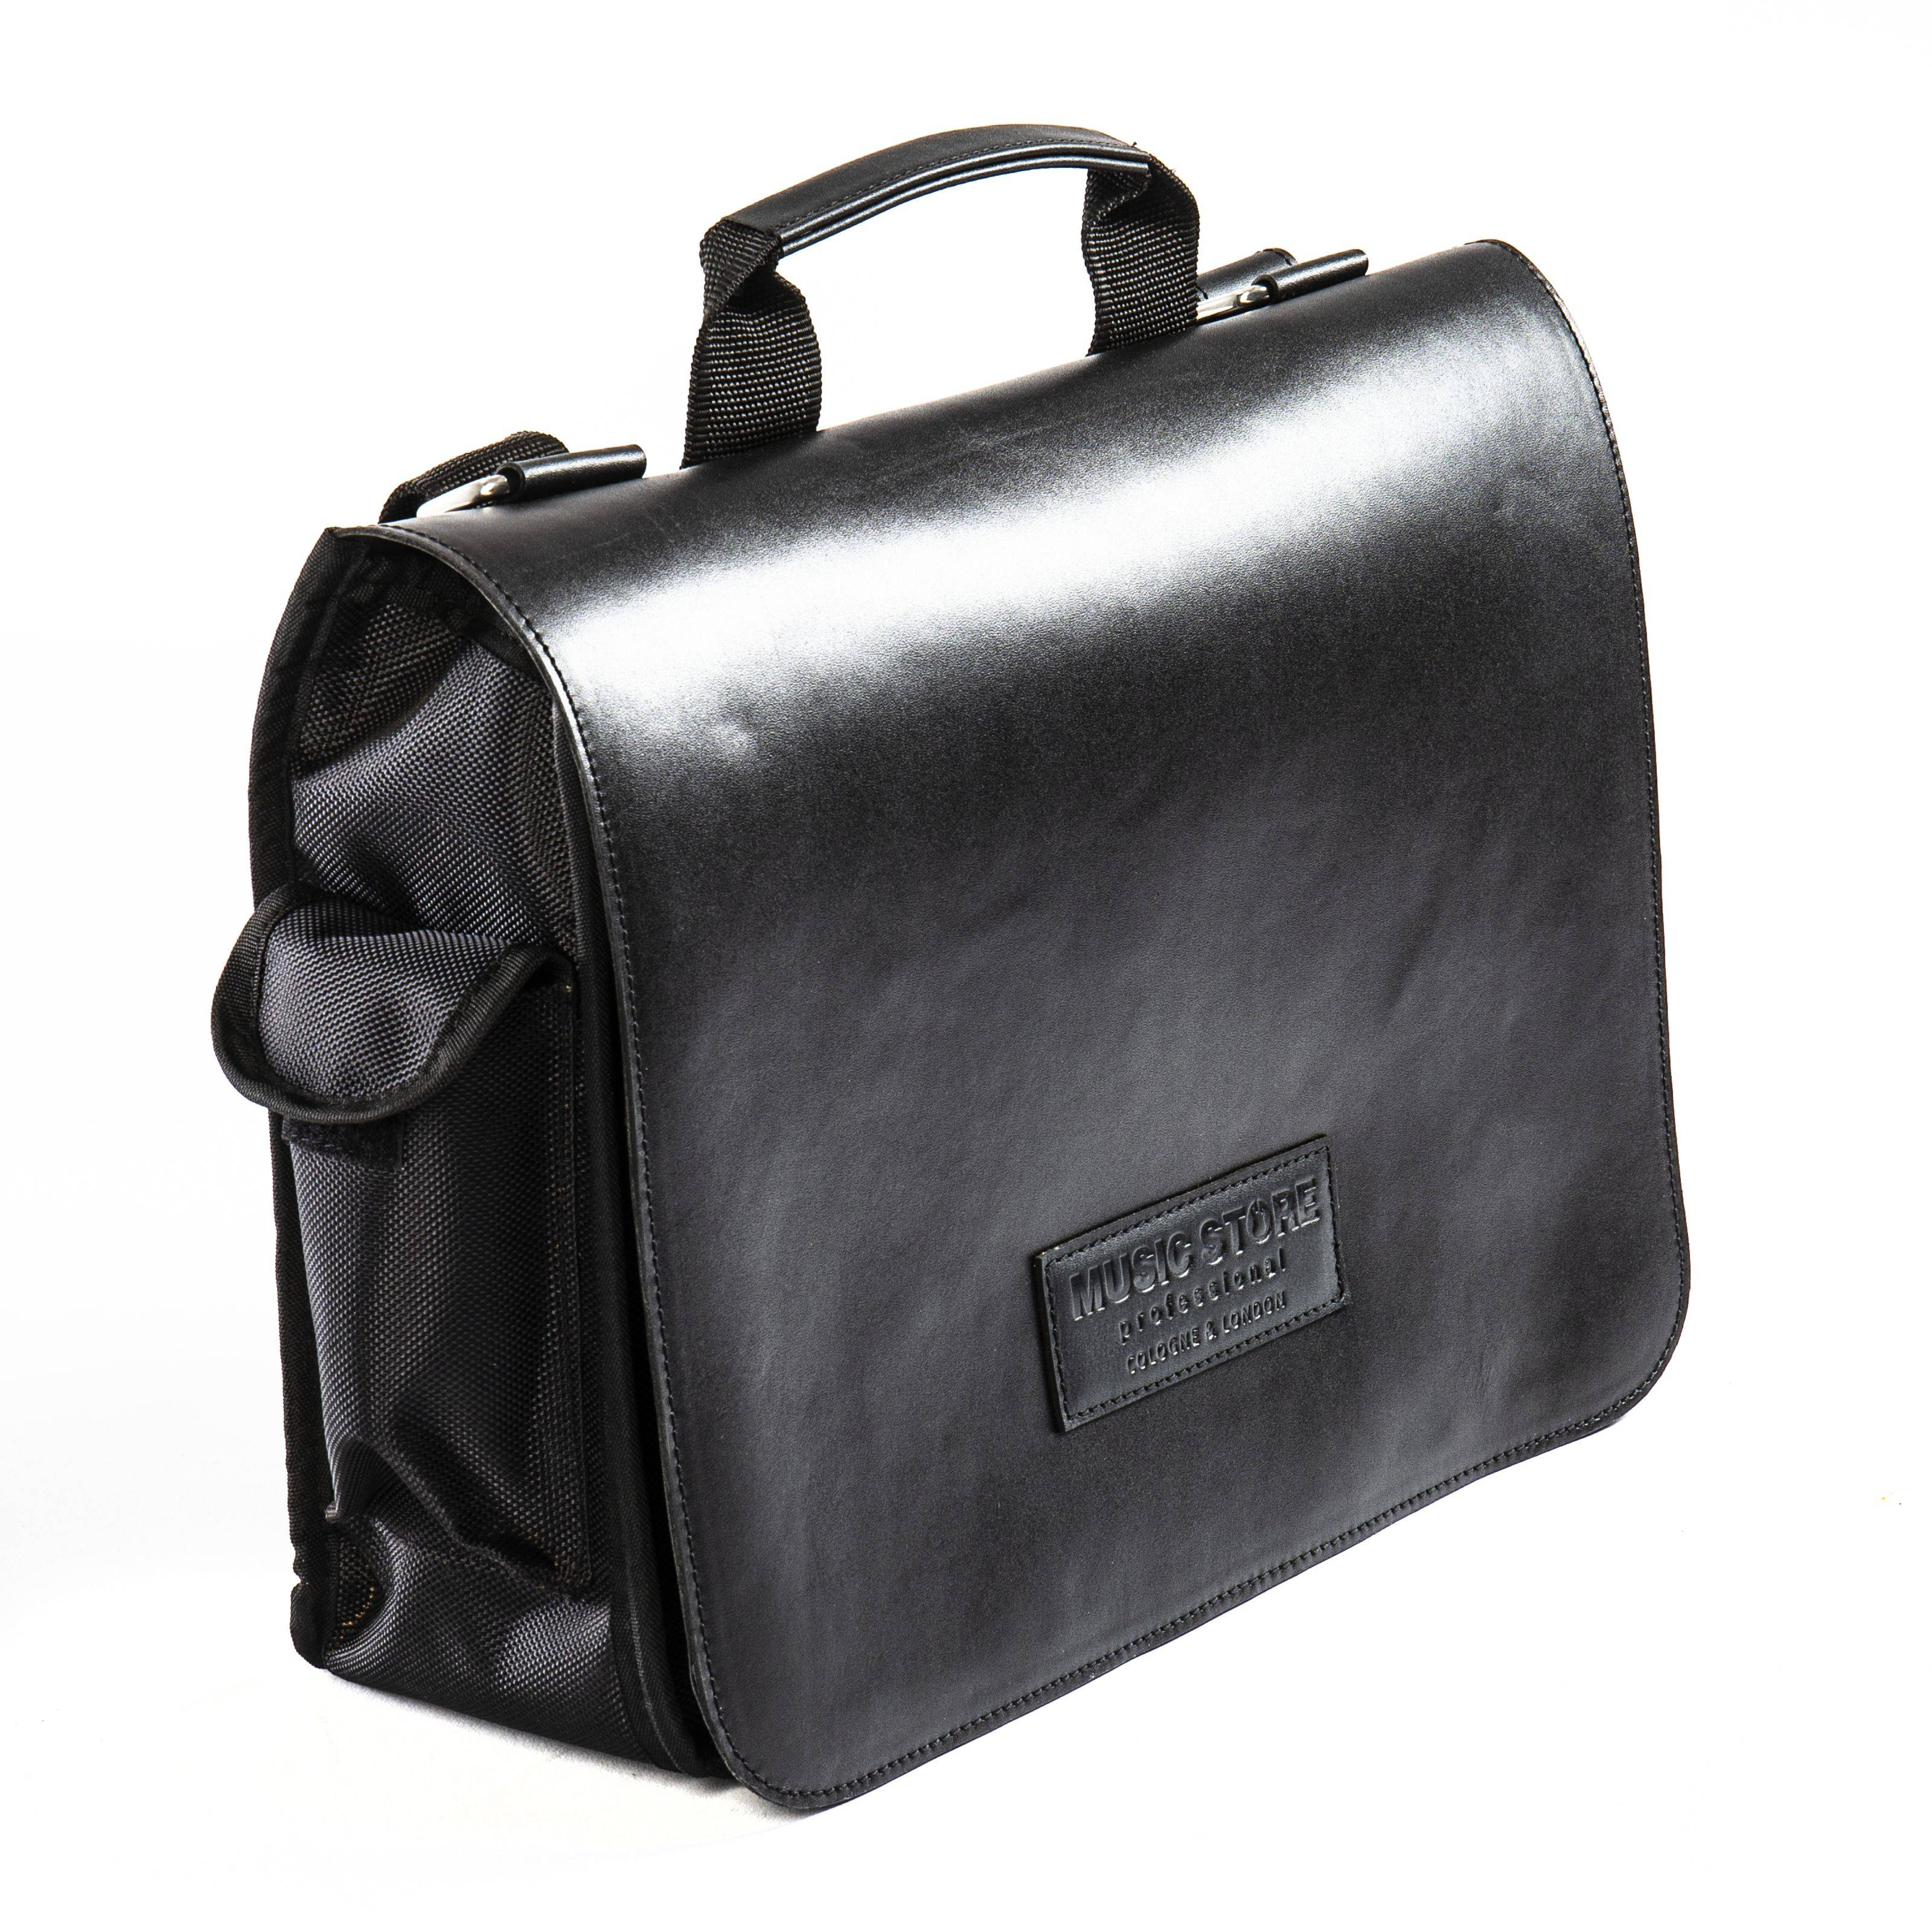 MUSIC STORE EXB-01MBK/6L Laptop Bag (Black)